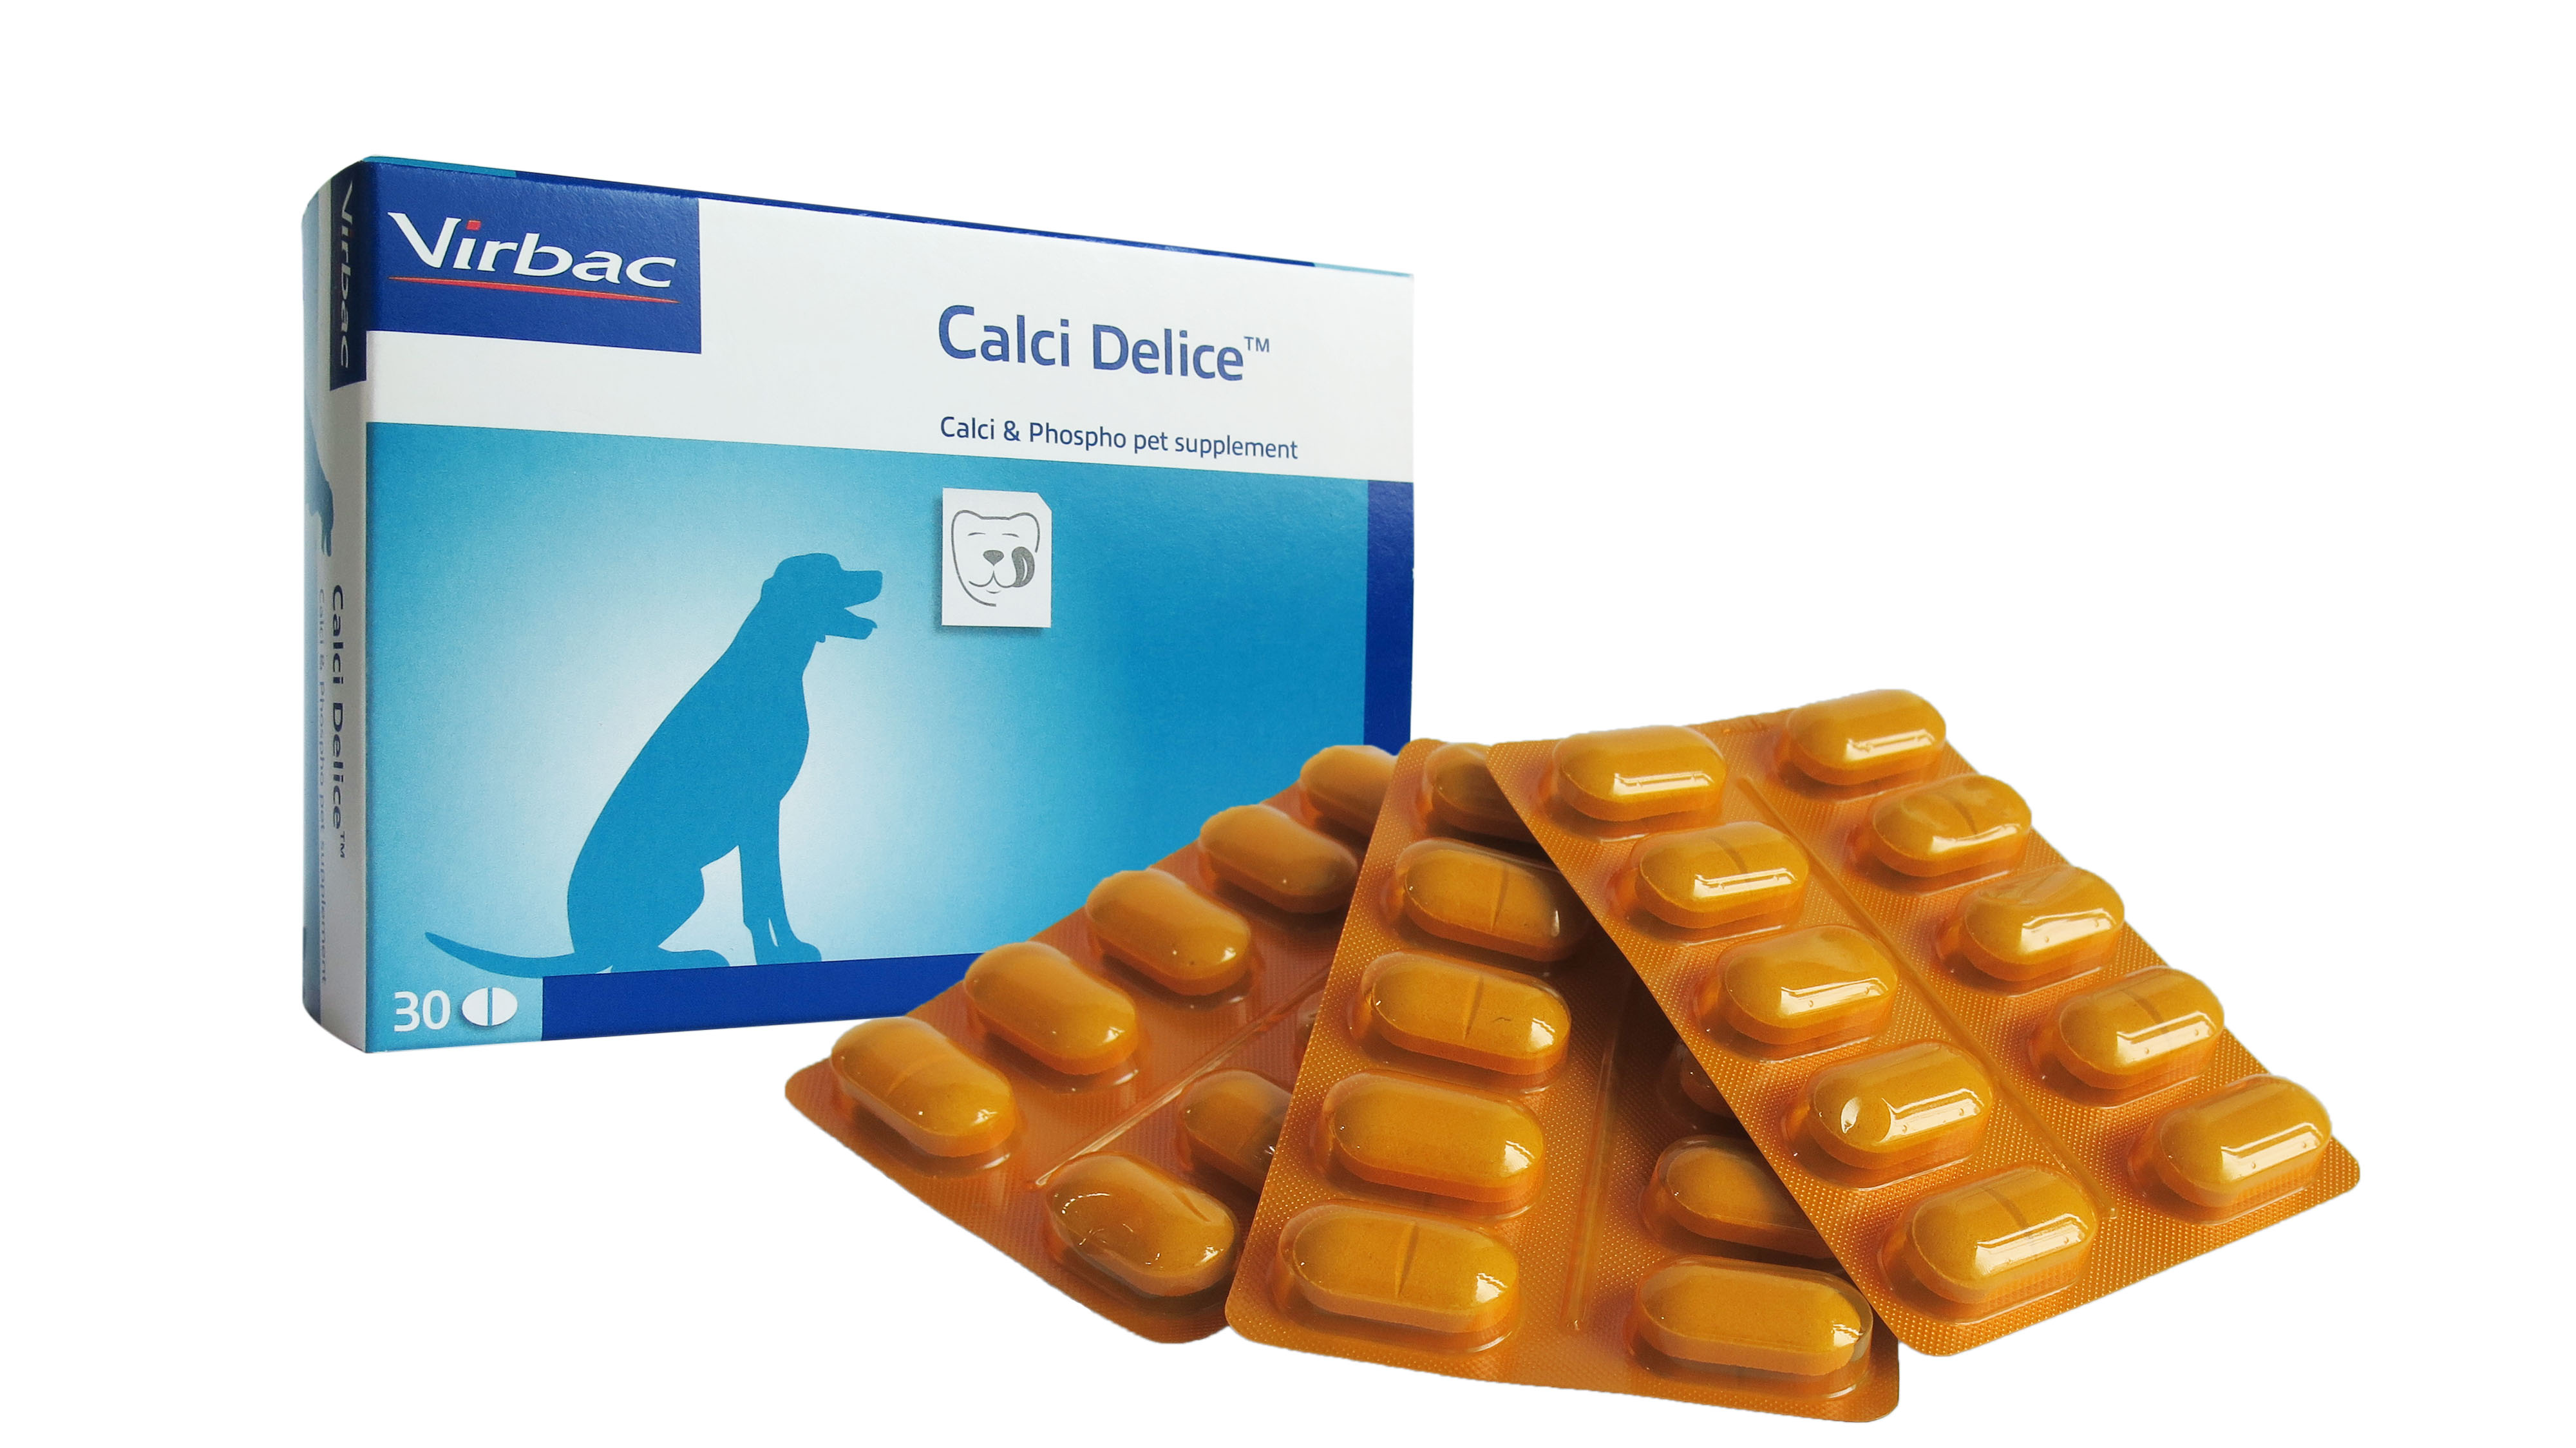 Virbac Calci Delice 30 tab.